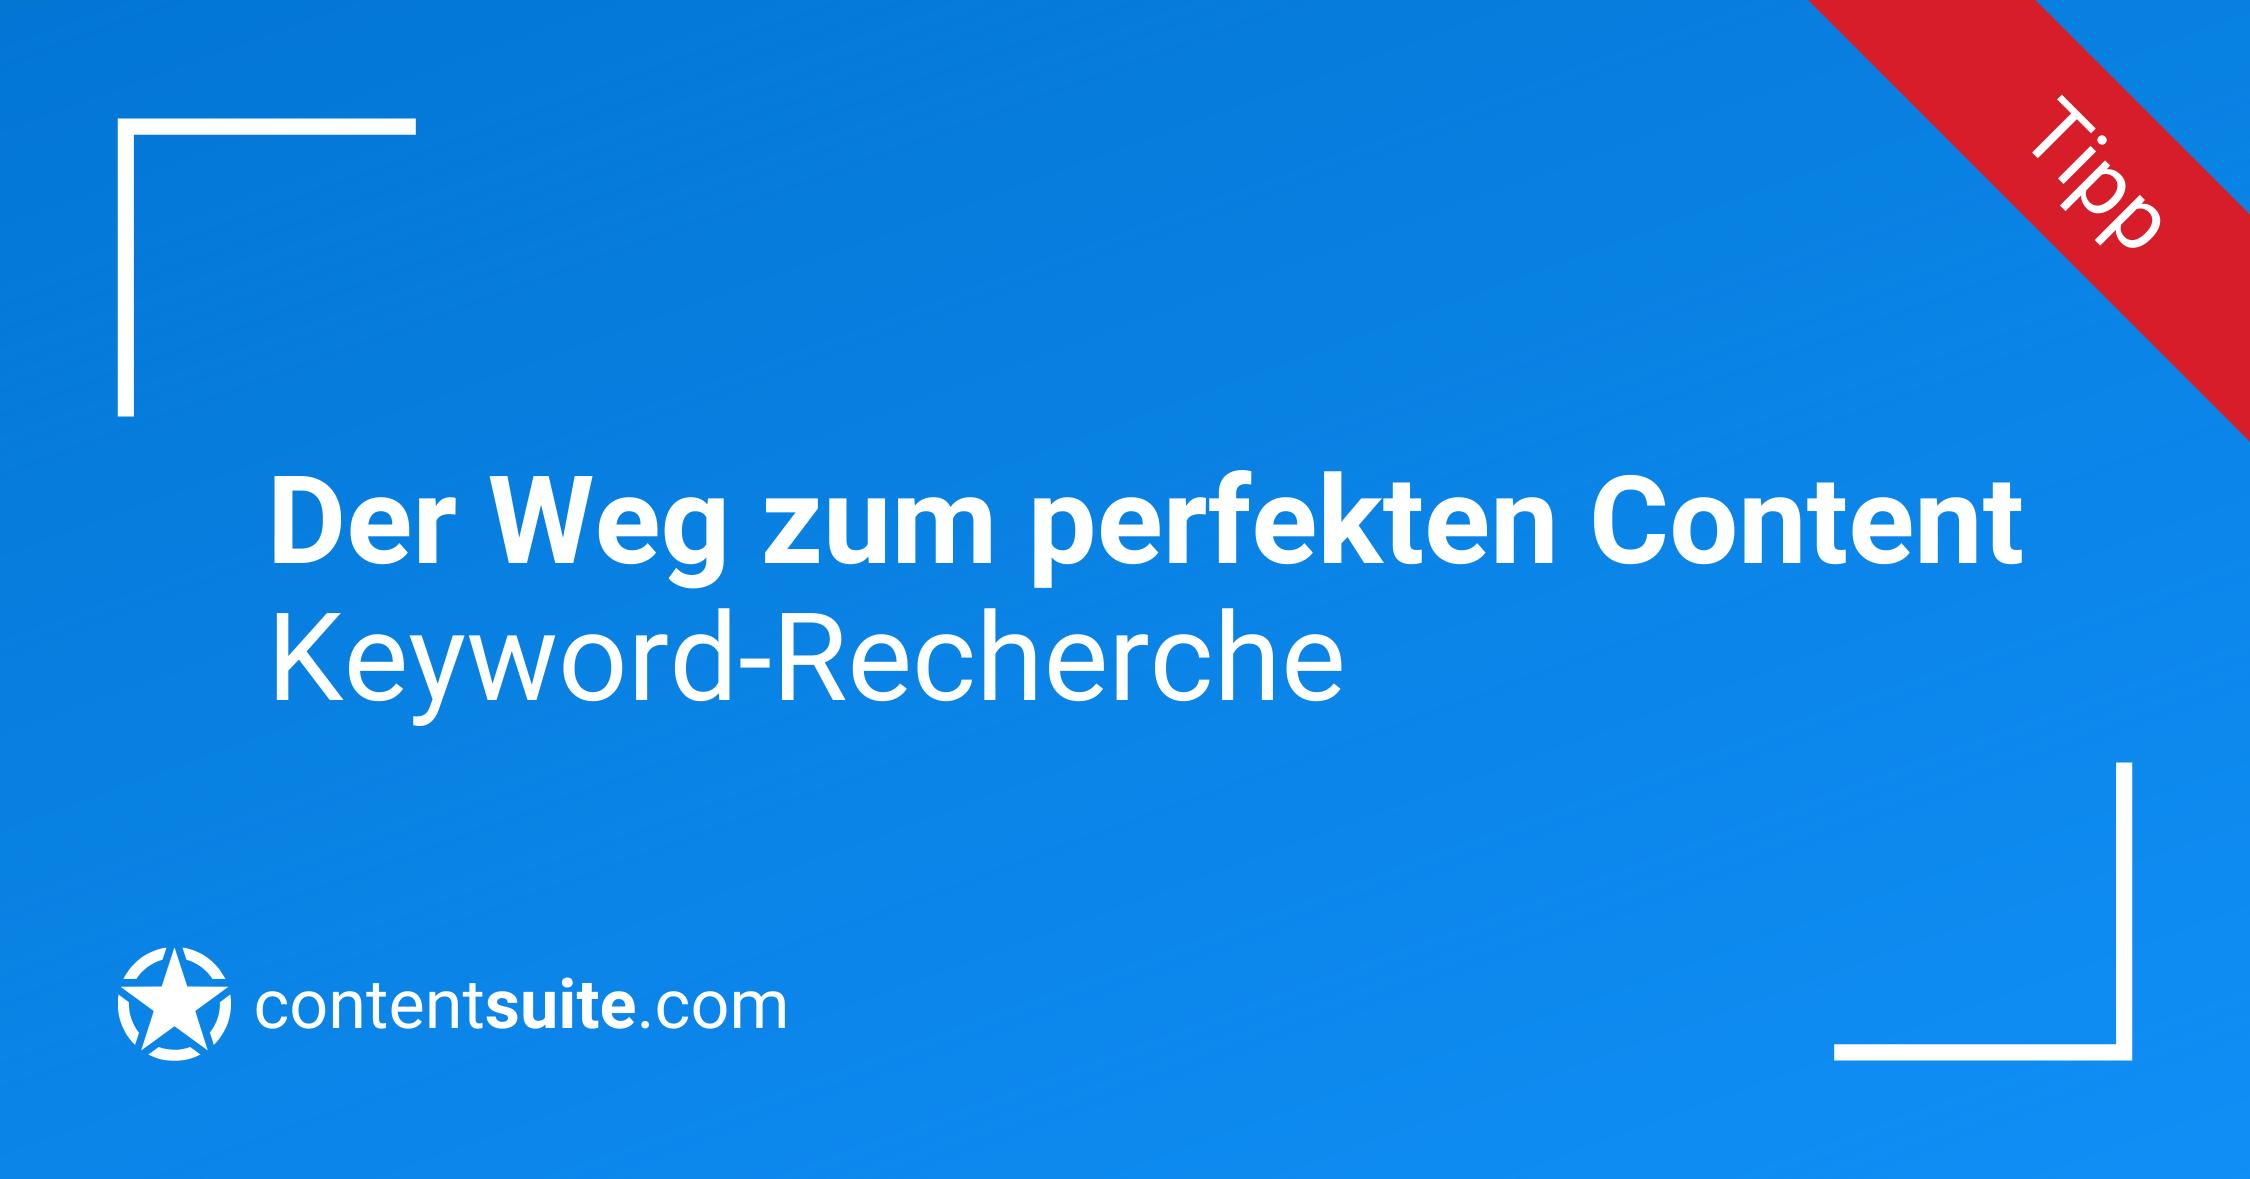 Keyword Recherche - der perfekte Content